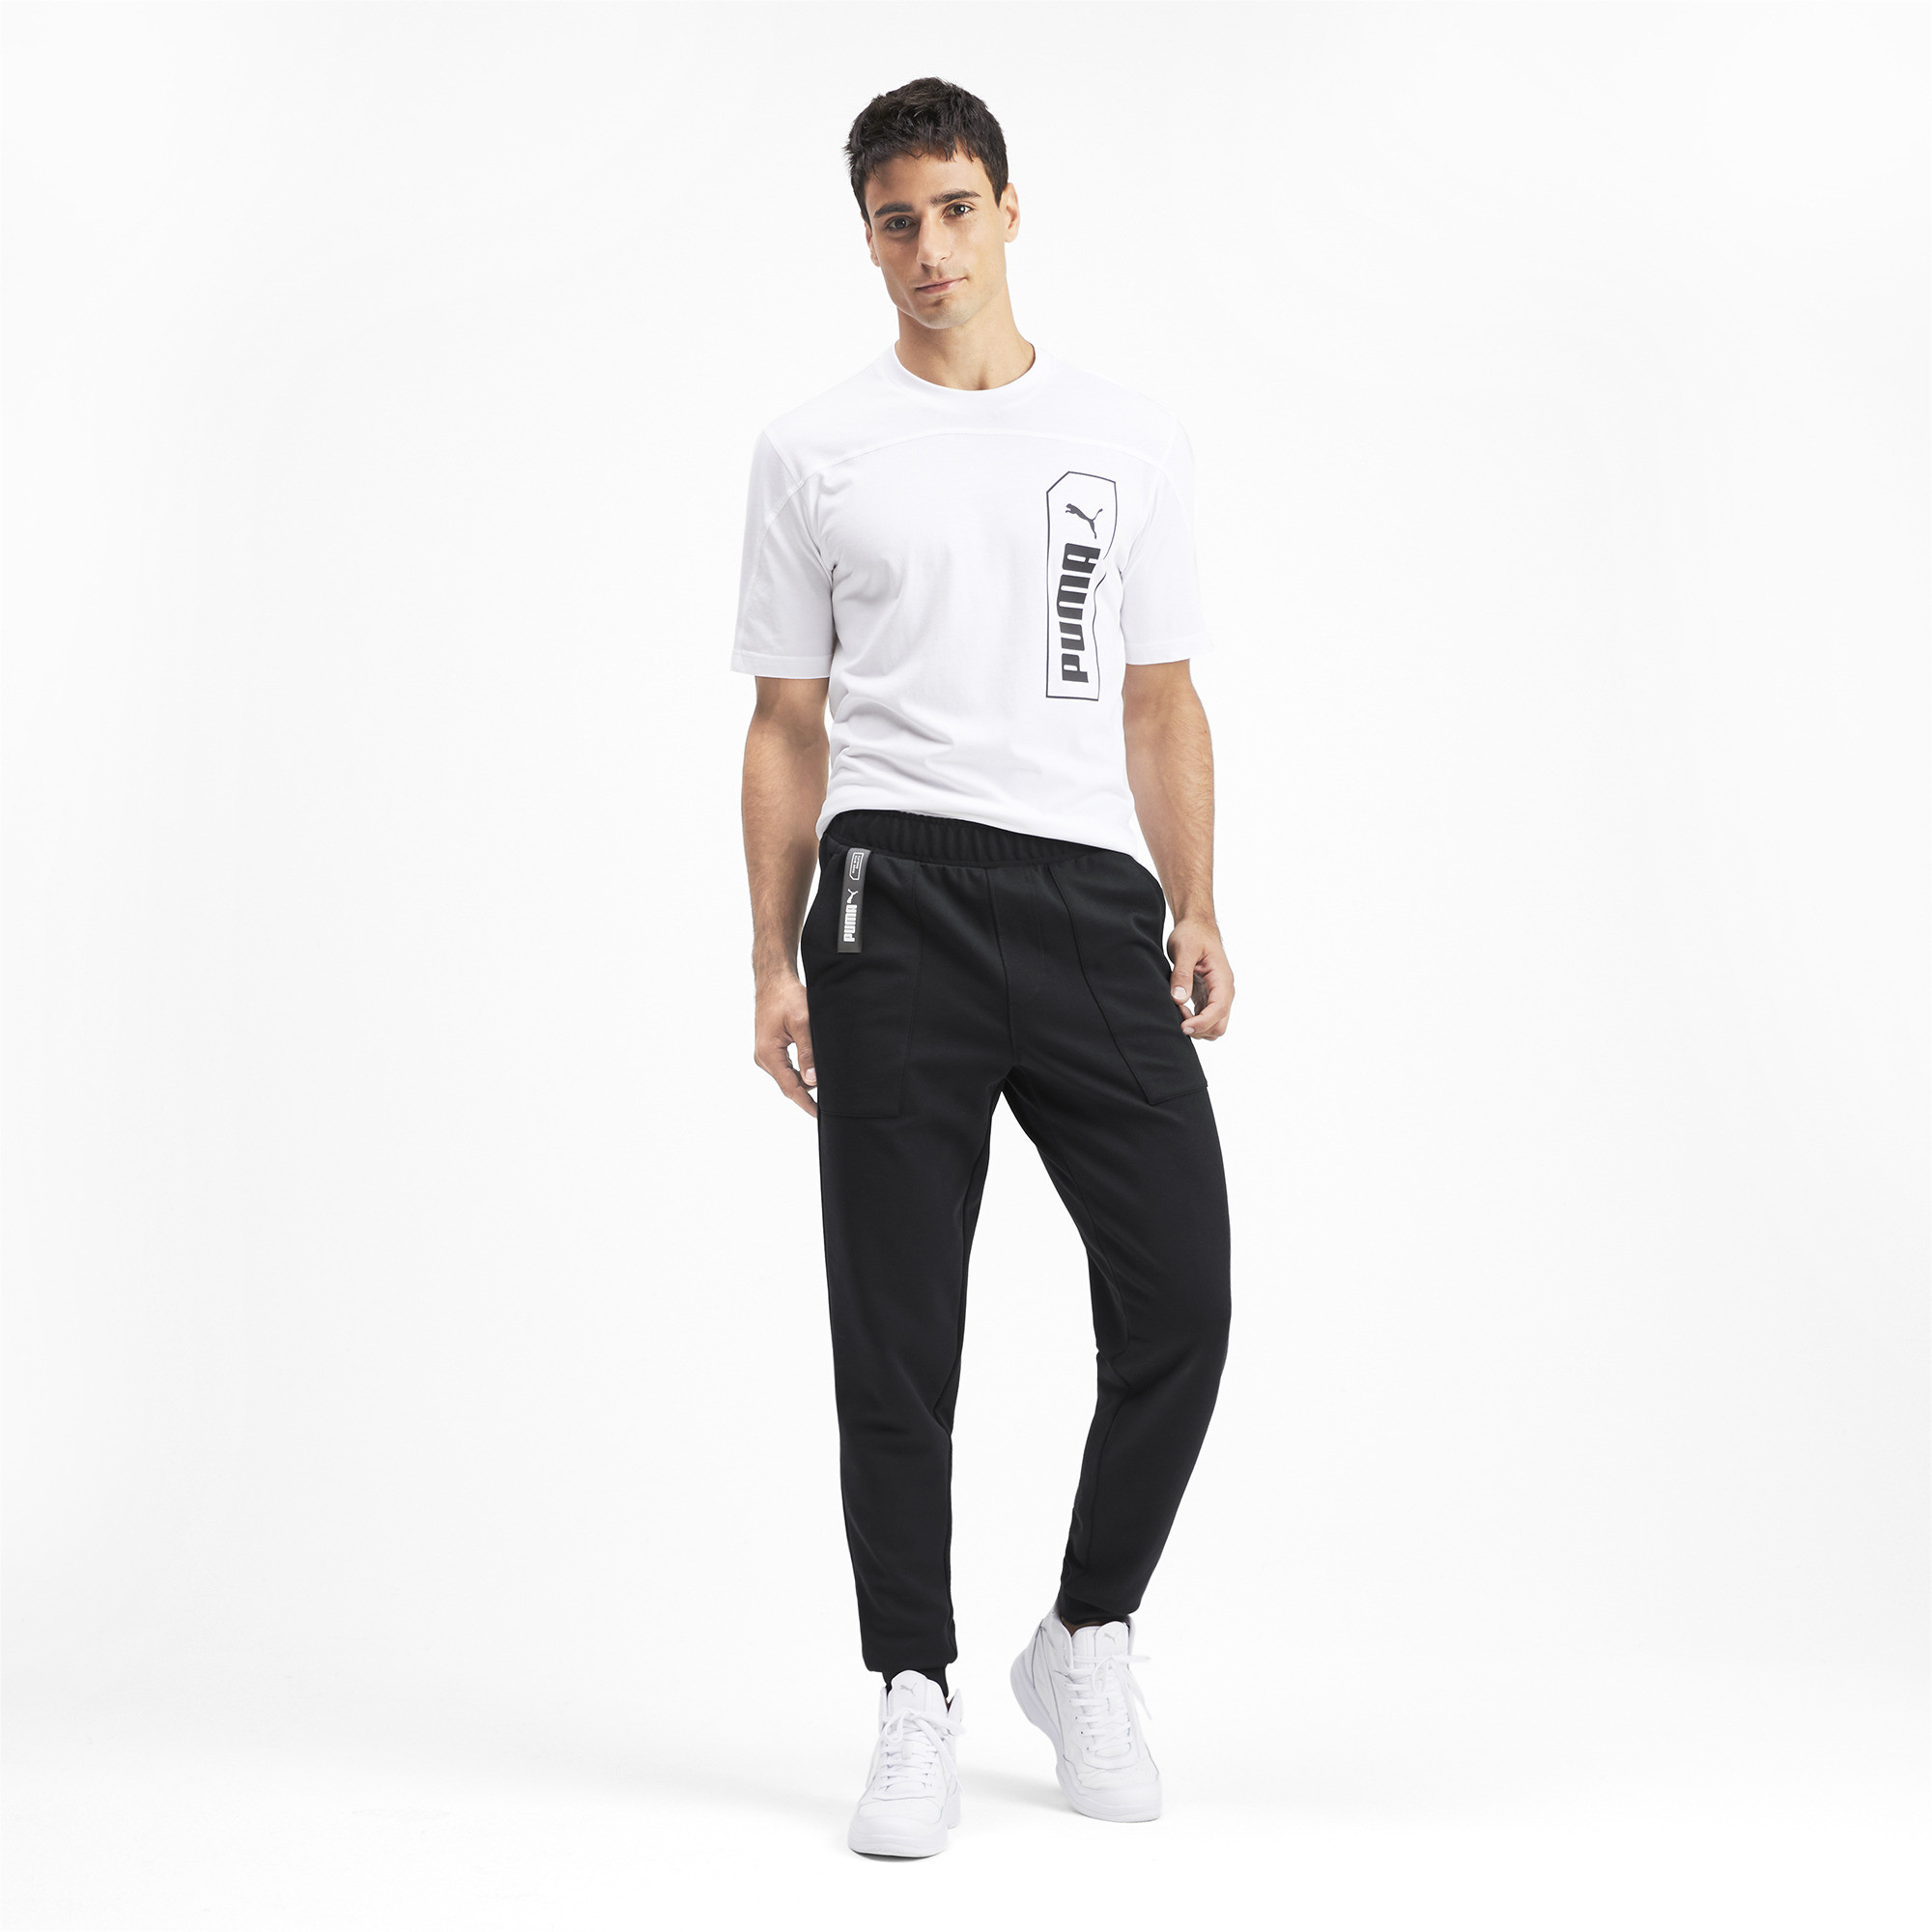 PUMA-NU-TILITY-Men-039-s-Sweatpants-Men-Knitted-Pants-Basics thumbnail 21